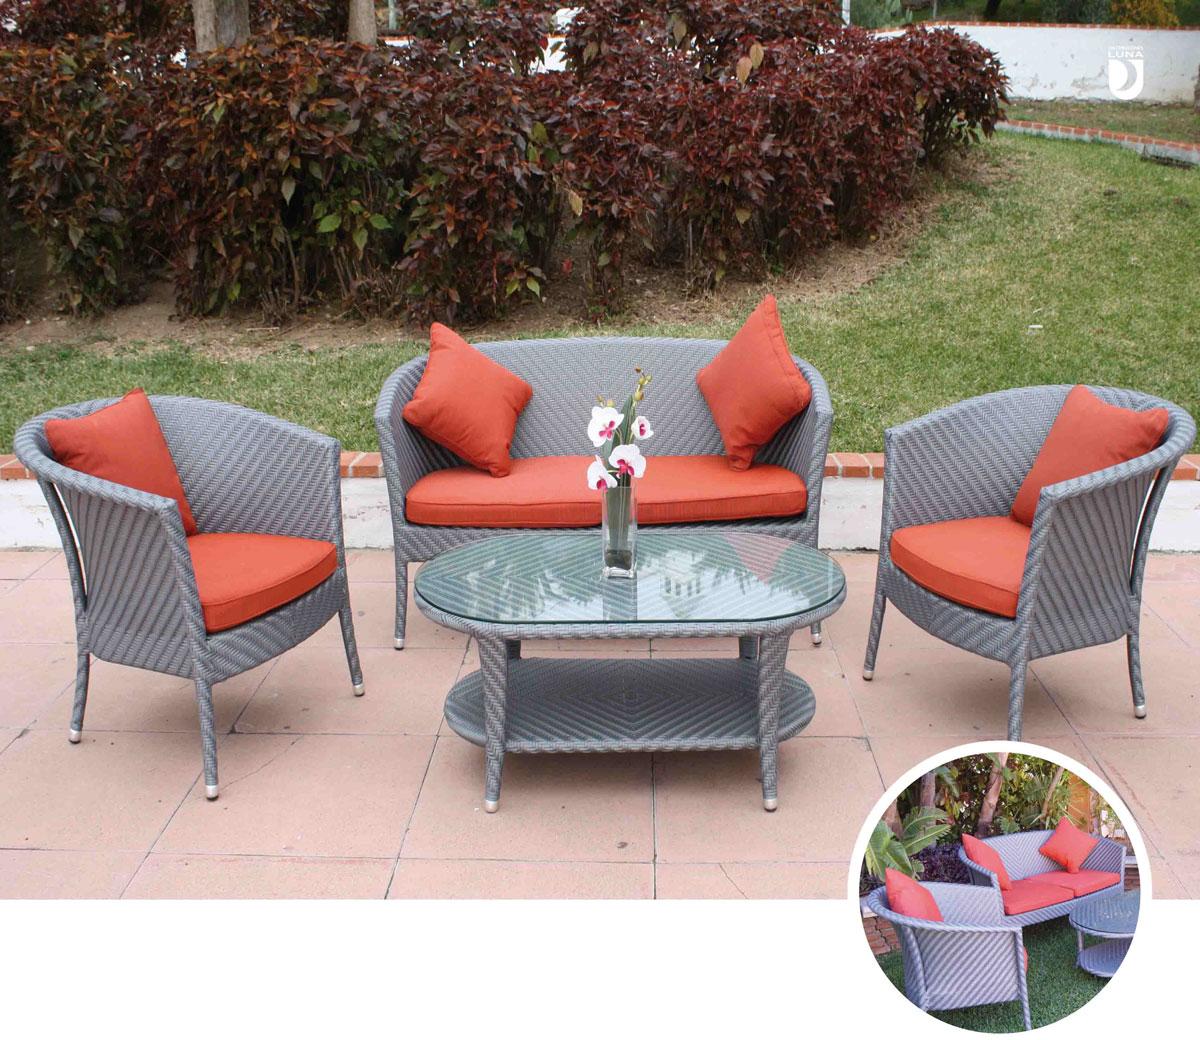 Set de sofá para exterior Florence - Set de muebles de sofá con trenzado de fibra sintetica para exterior Florence